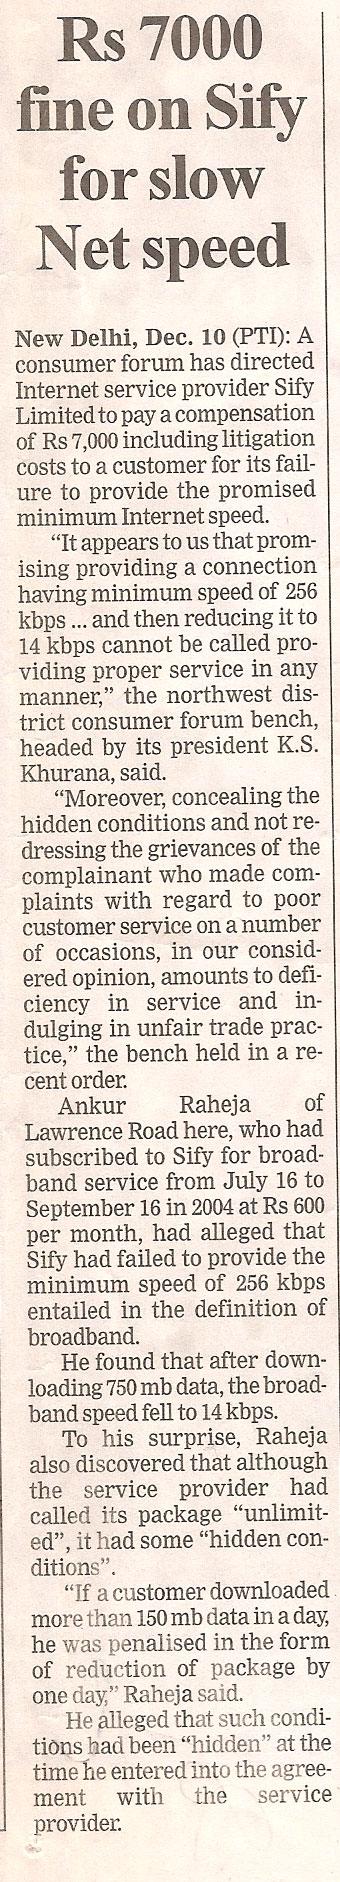 SIFY case reported in Telegraph Kolkatta